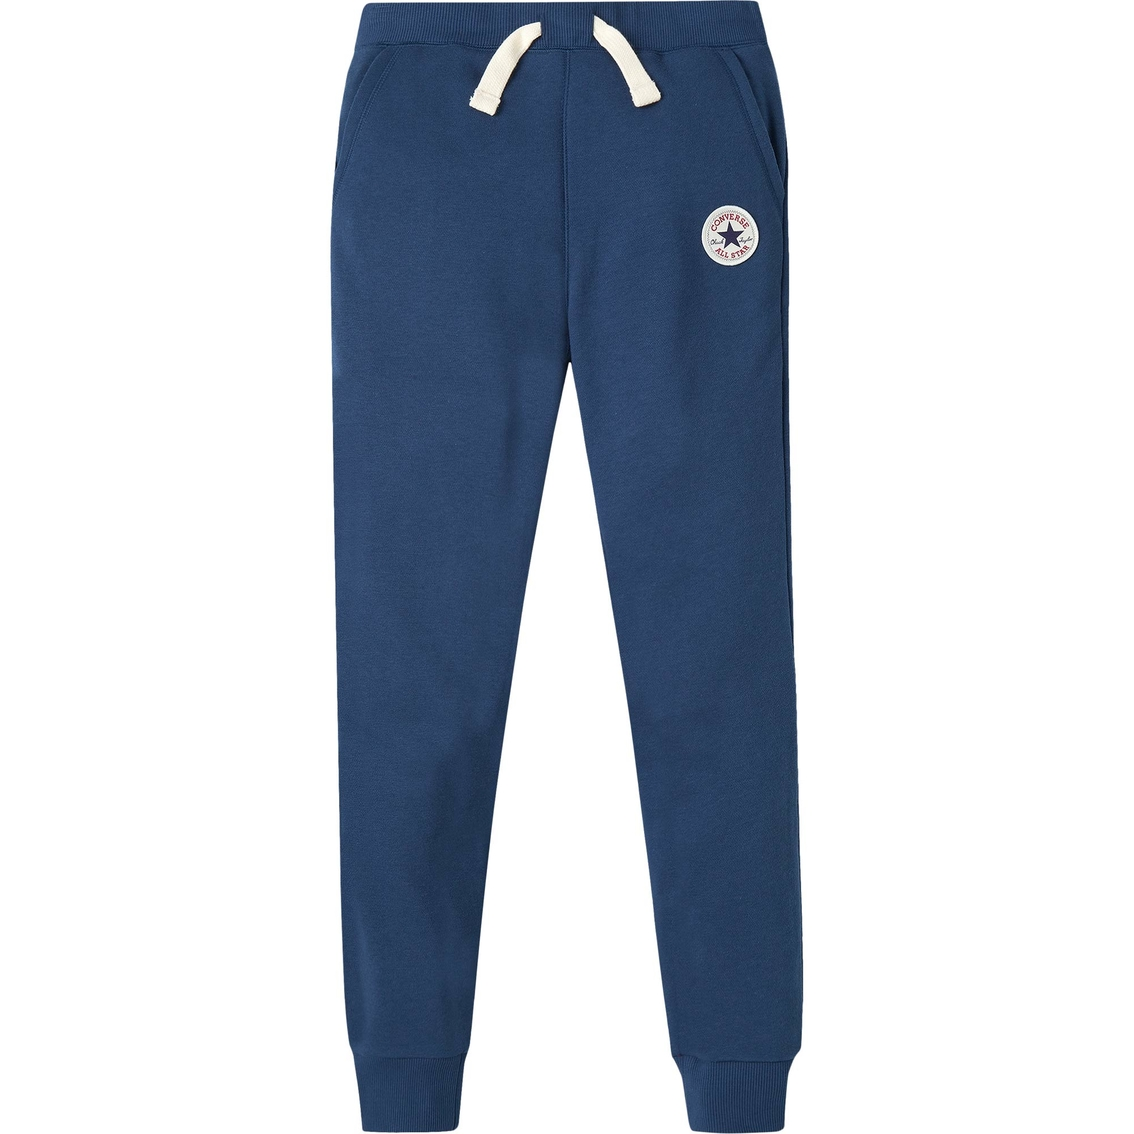 3966d7153bfa Converse Boys Core French Terry Pants